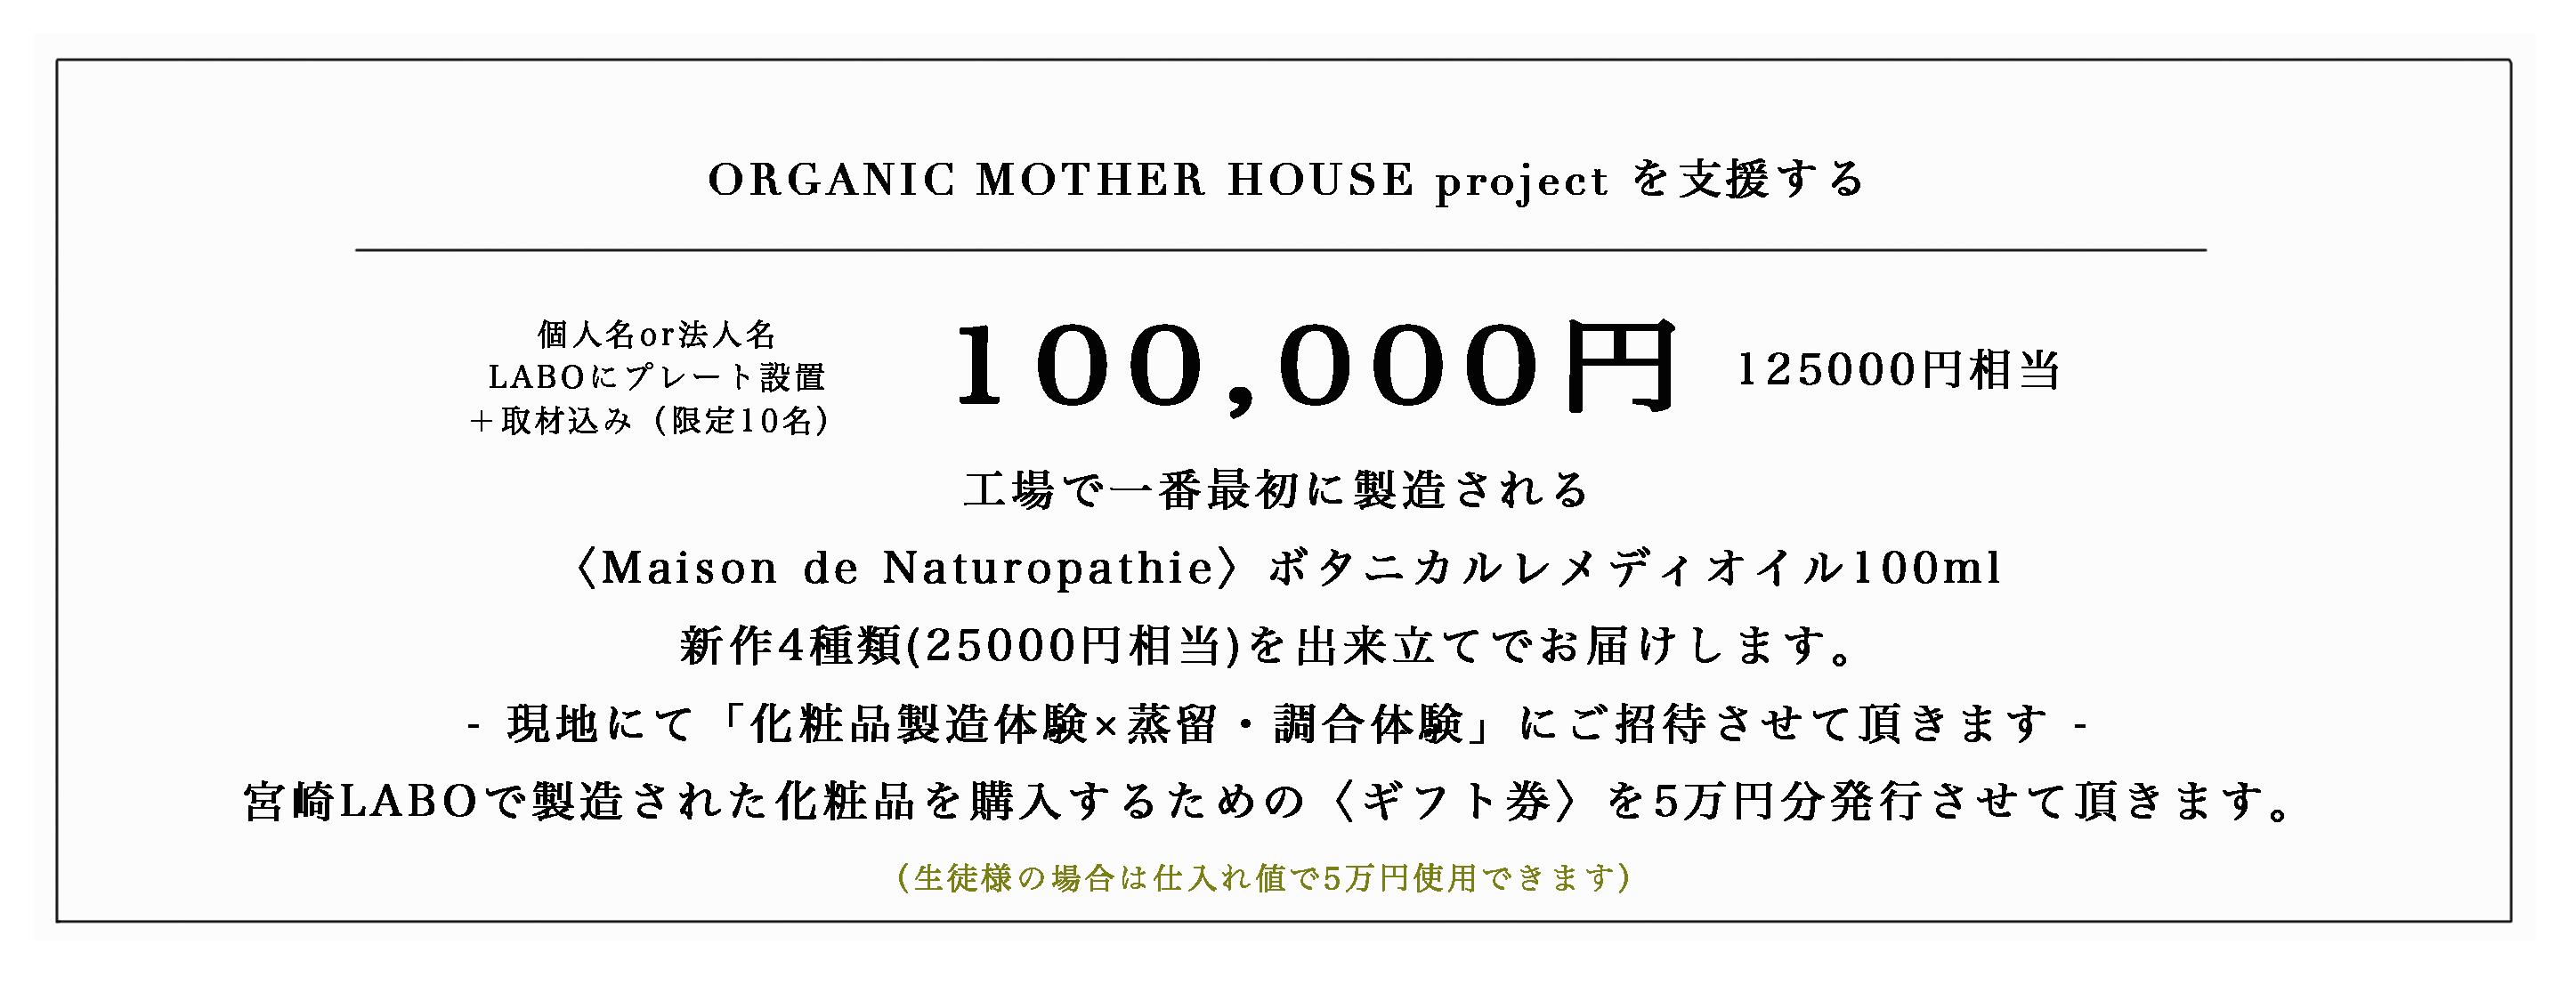 ORGANIC MOTHER HOUSE〈植物調合美容研究所〉10万